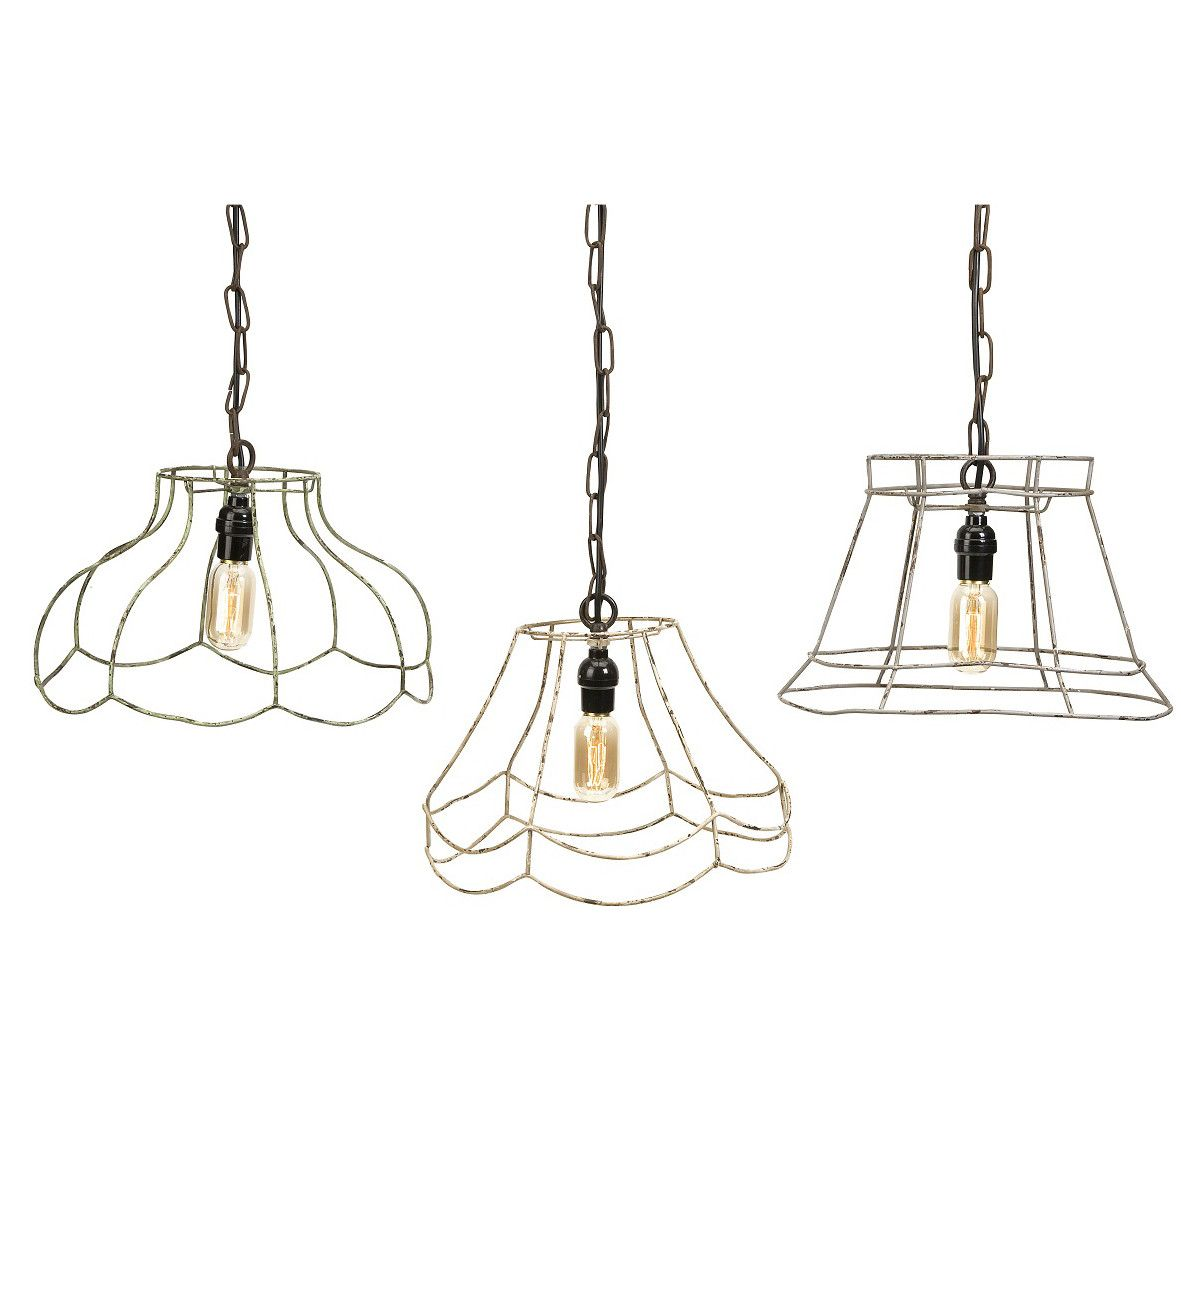 Modern rustic industrial wire frame pendants lights master bedroom